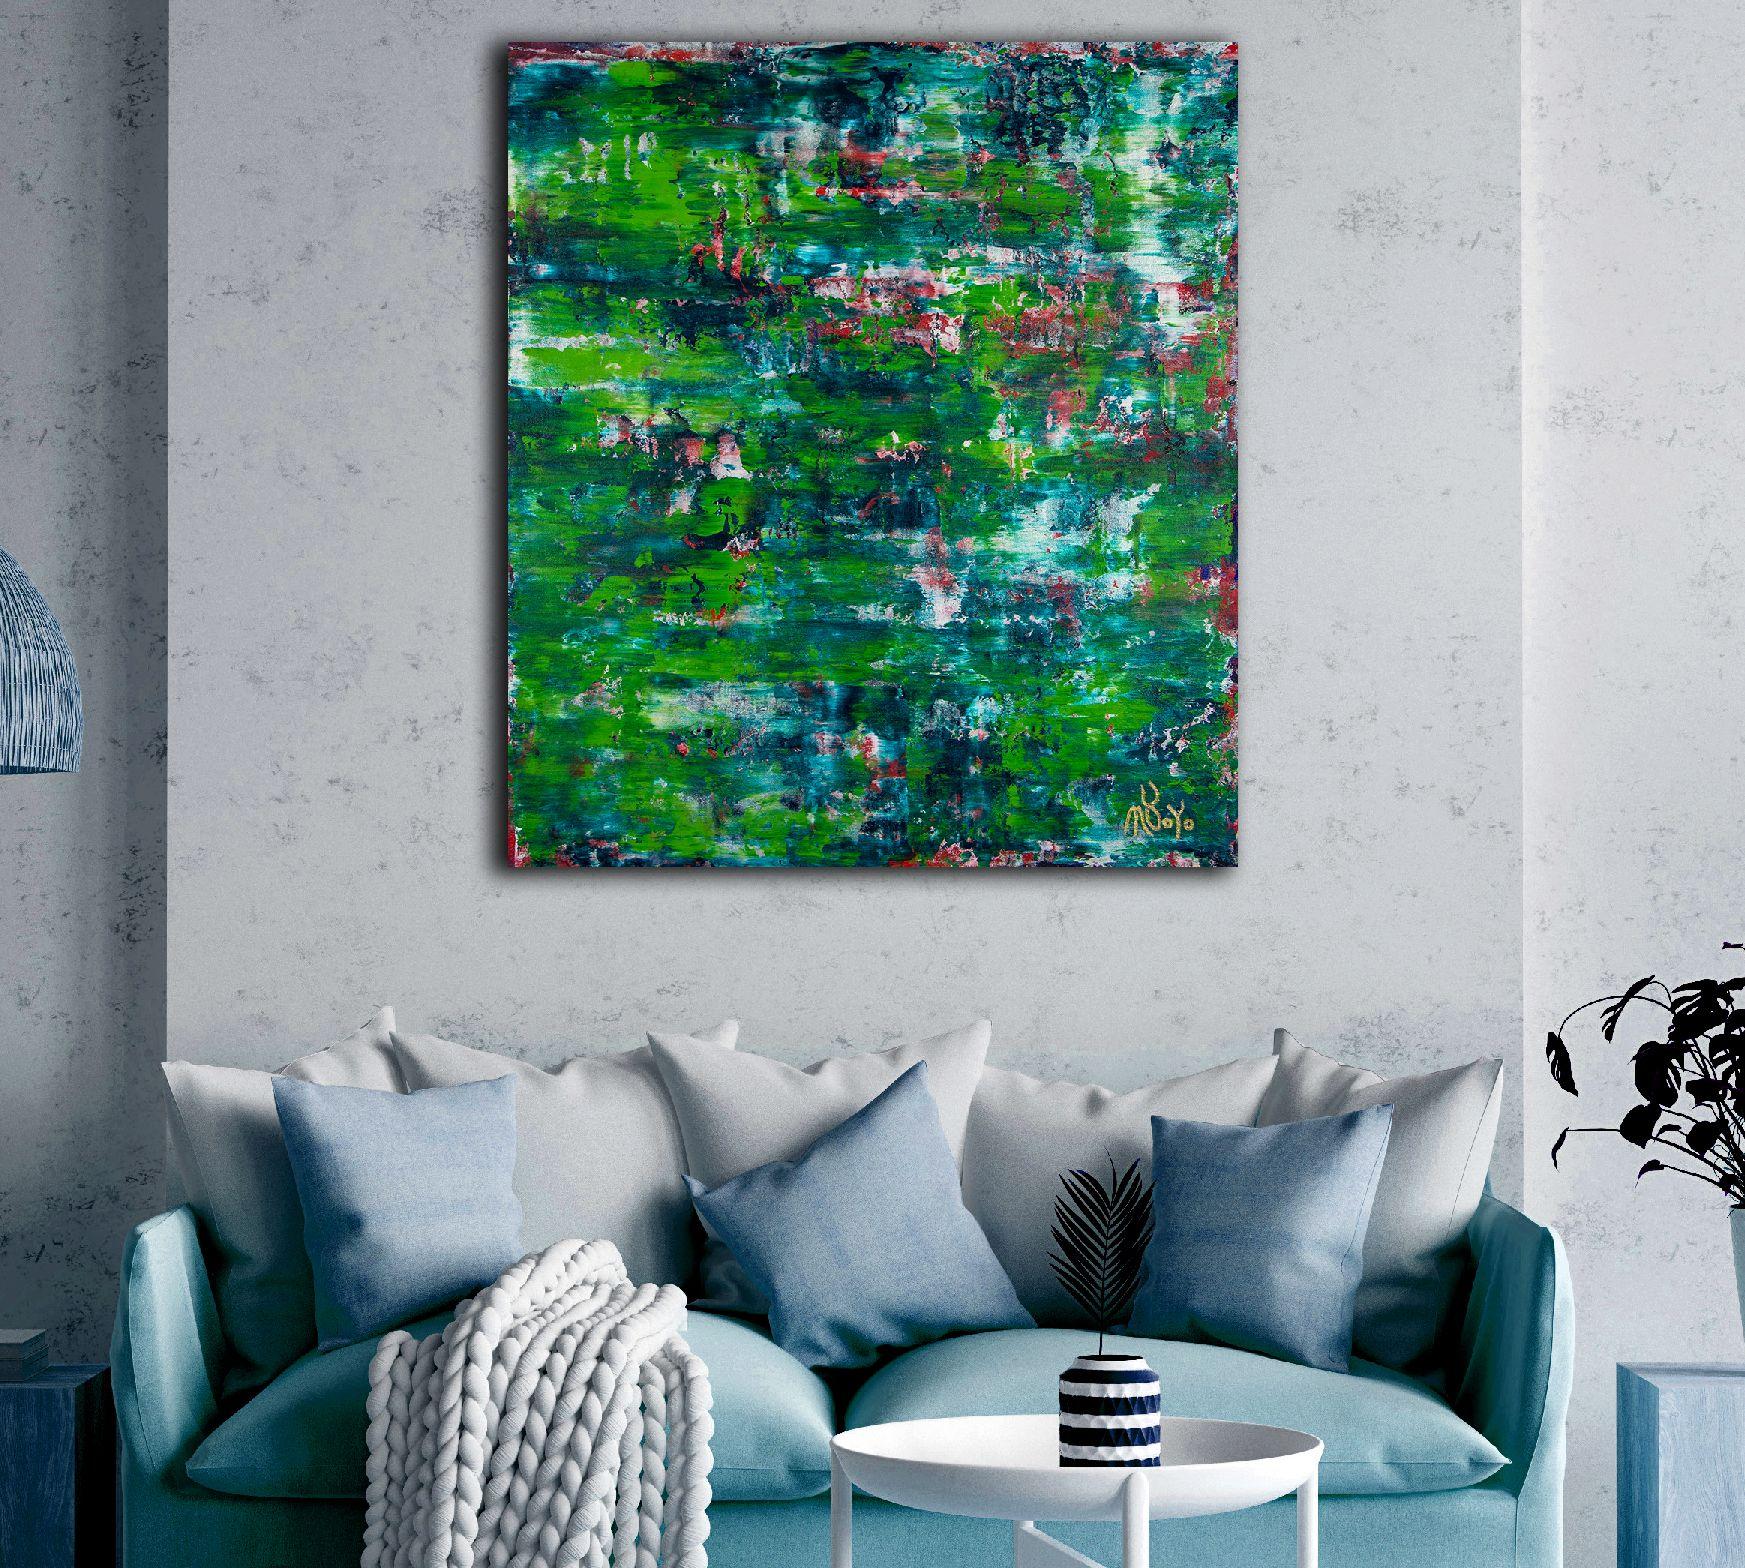 Room View - Verdor Infinito 2 (2020) by Nestor Toro